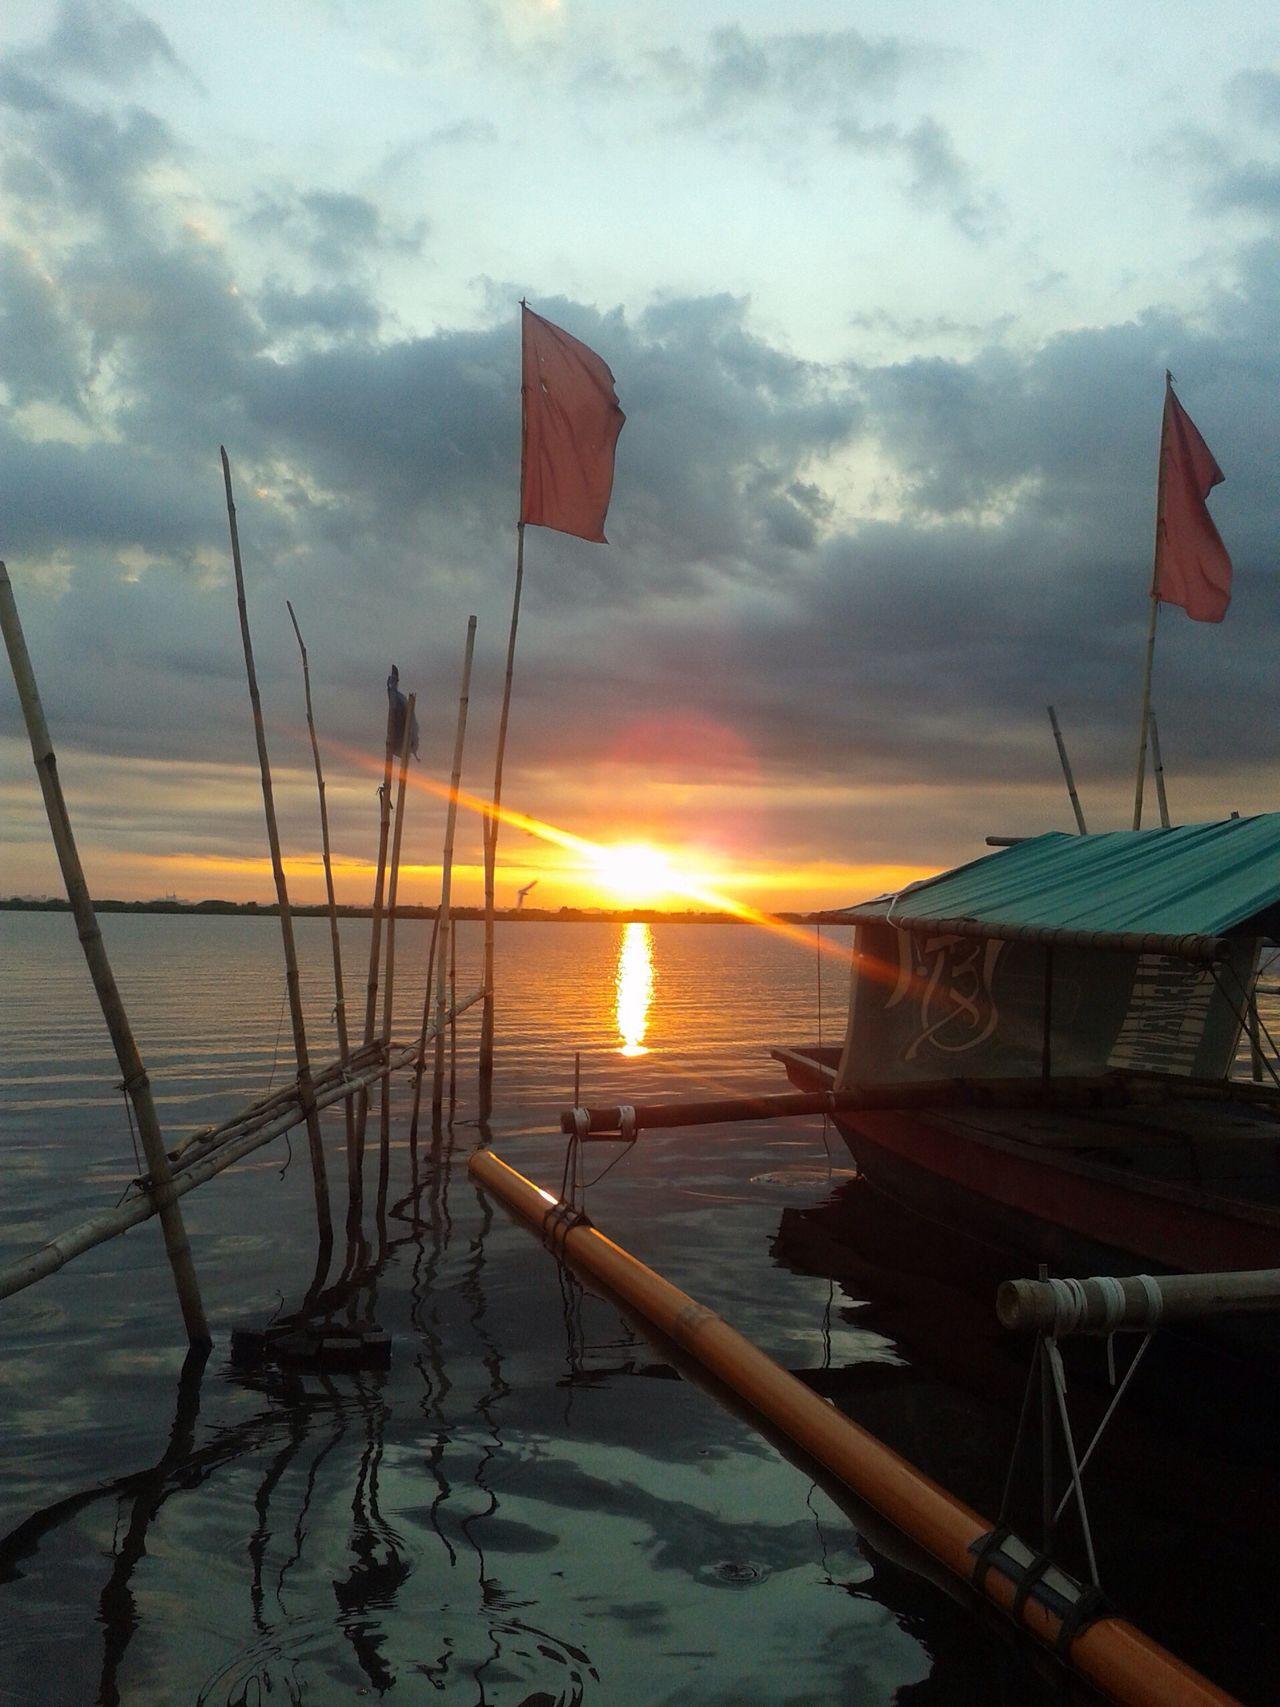 Wawa ng Angono Philippines Rizal Angonorizal Artcapital LagunaDeBay Pilipinas Sunset Sunsetphotography Sunsetphotographs Boat Colour Of Life Hidden Gems